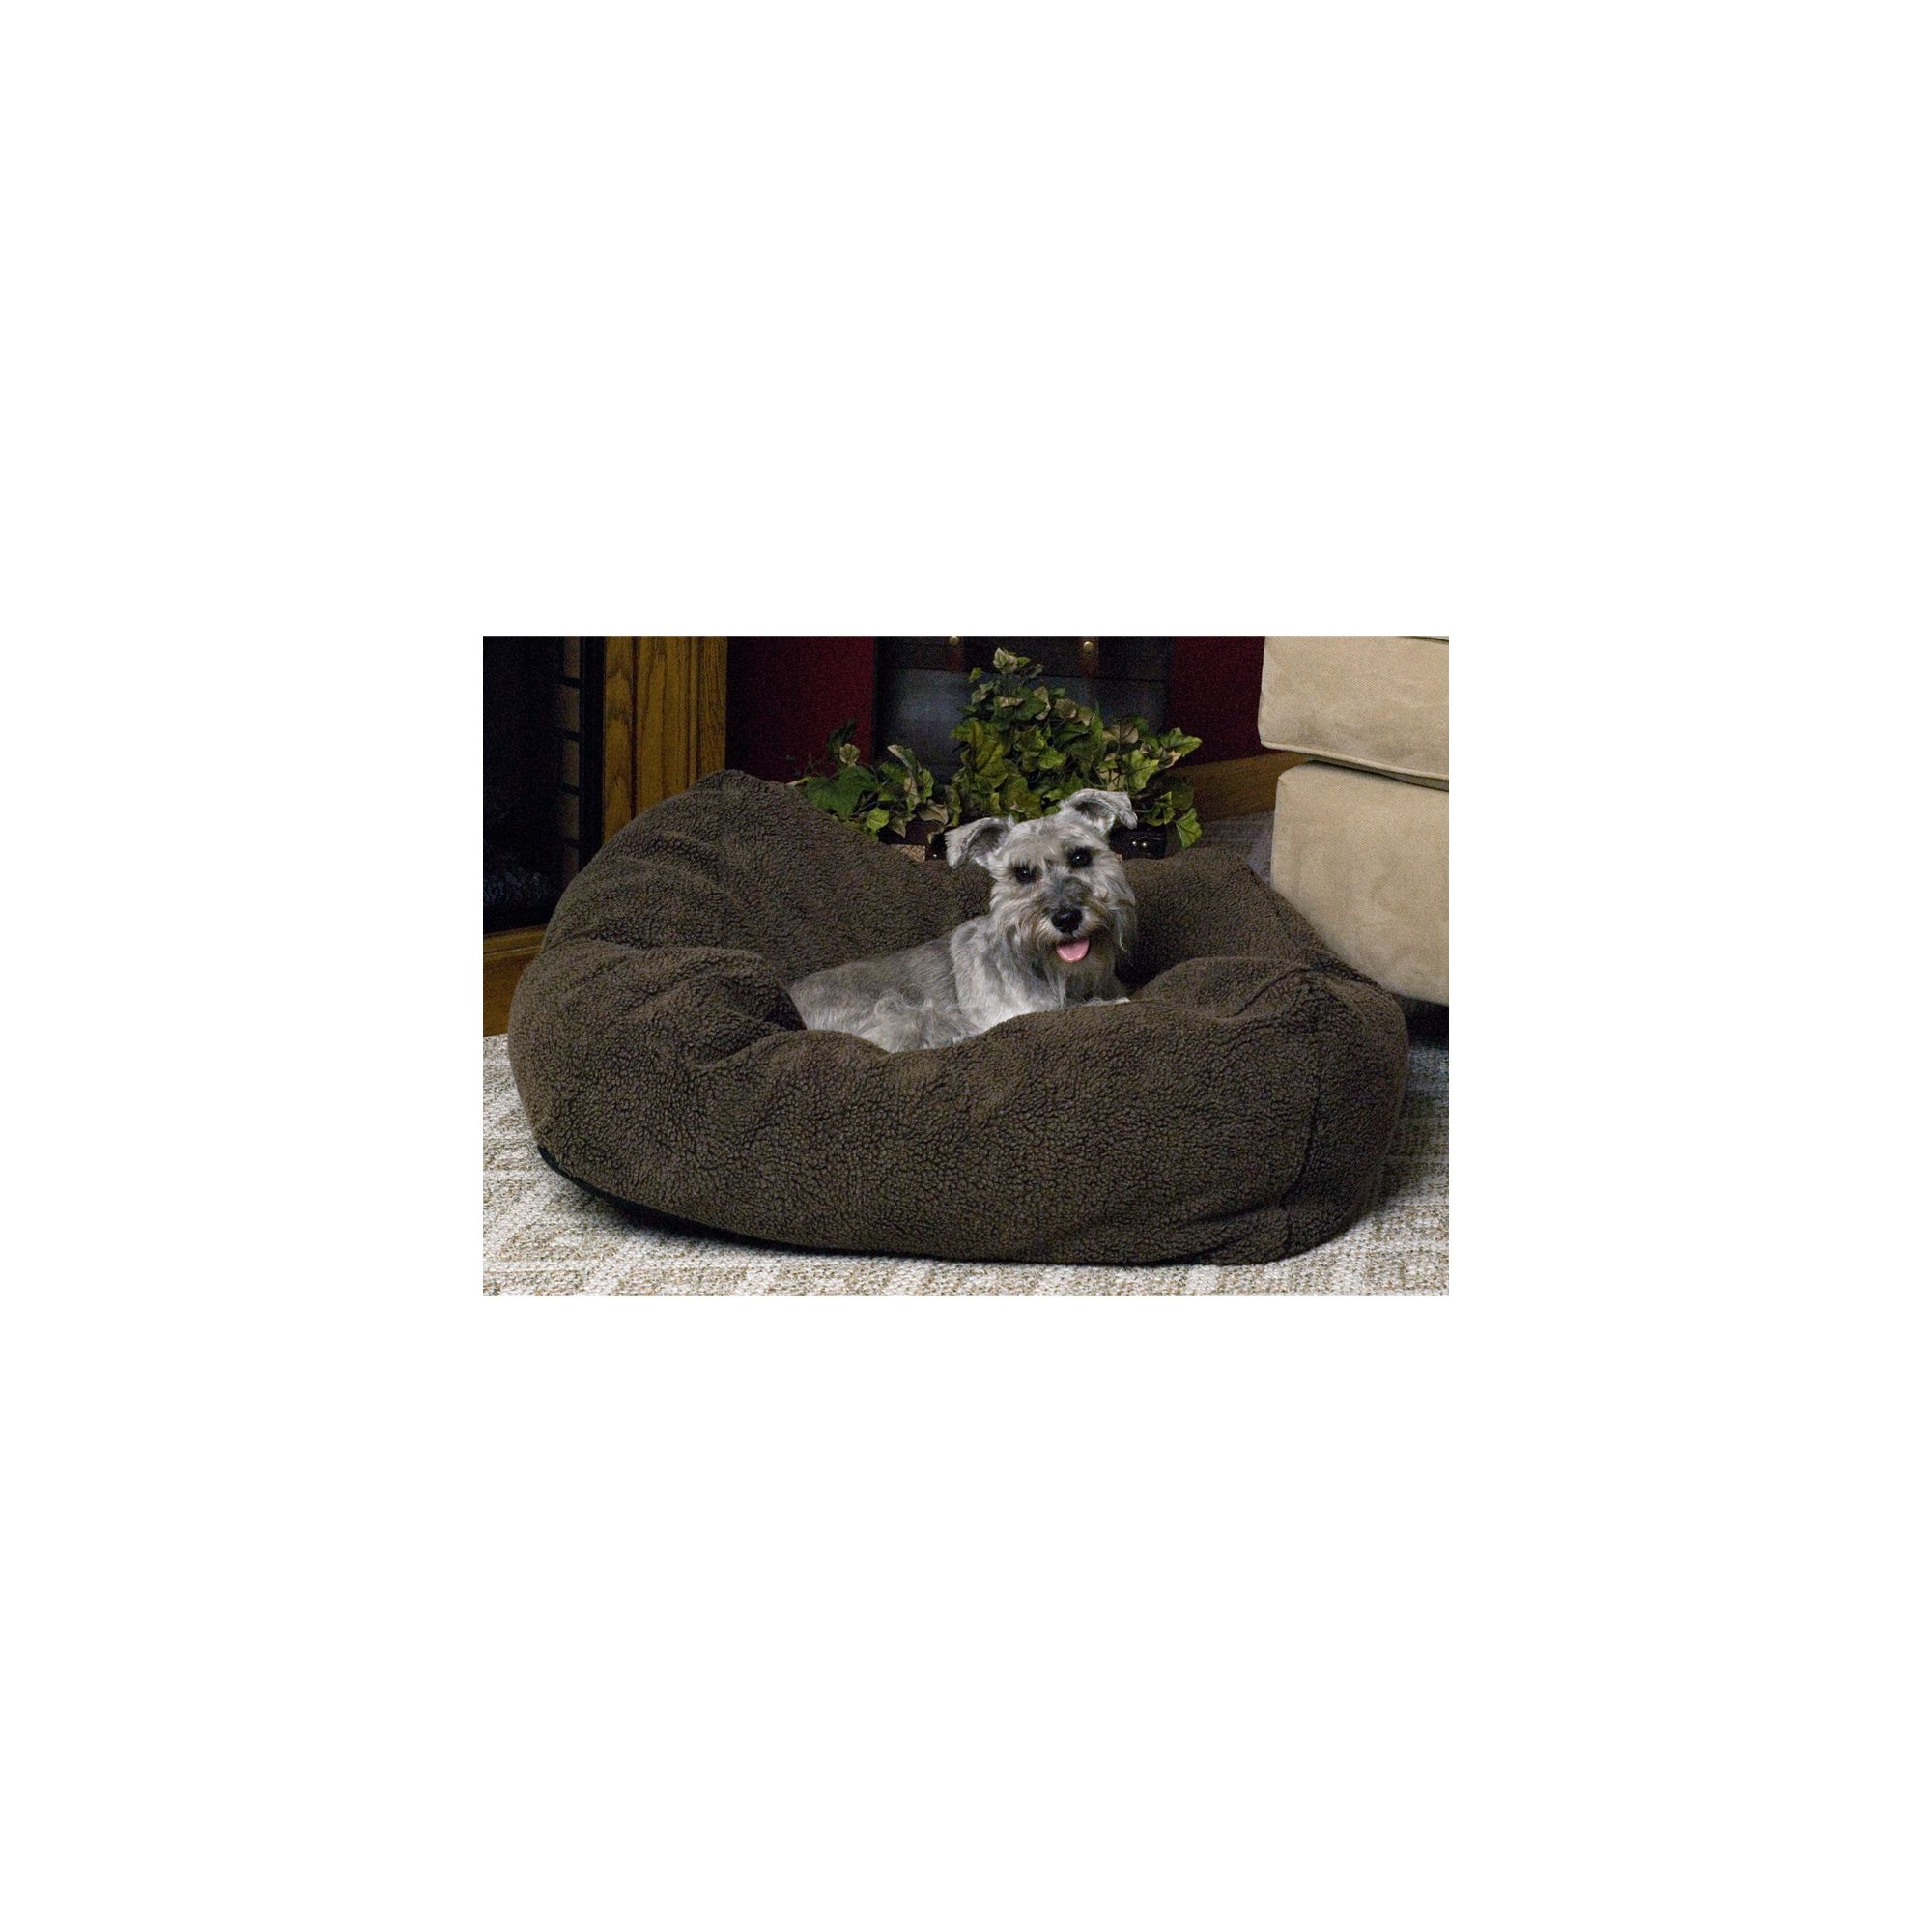 "KandH Cuddle Cube Pet Bed size 28""L x 28""W"", K&H, Brown"